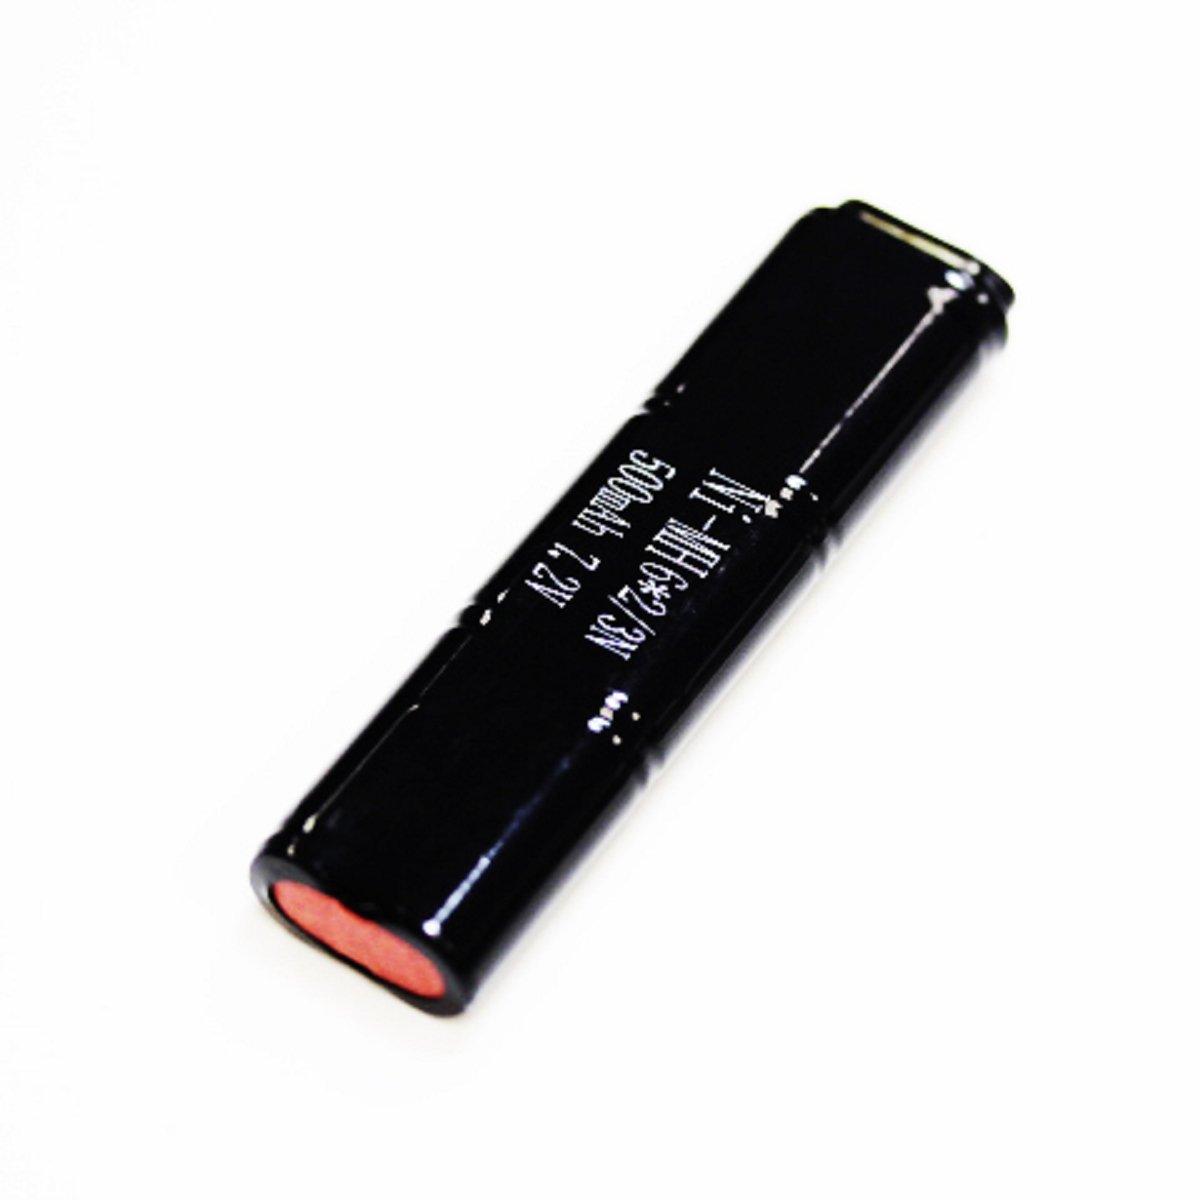 CYMA 7, 2 V 500 maH Ni-MH rechargeable batterie pour airsoft AEG CYMA AEP Series 2V 500maH Ni-MH rechargeable batterie pour airsoft AEG CYMA AEP Series